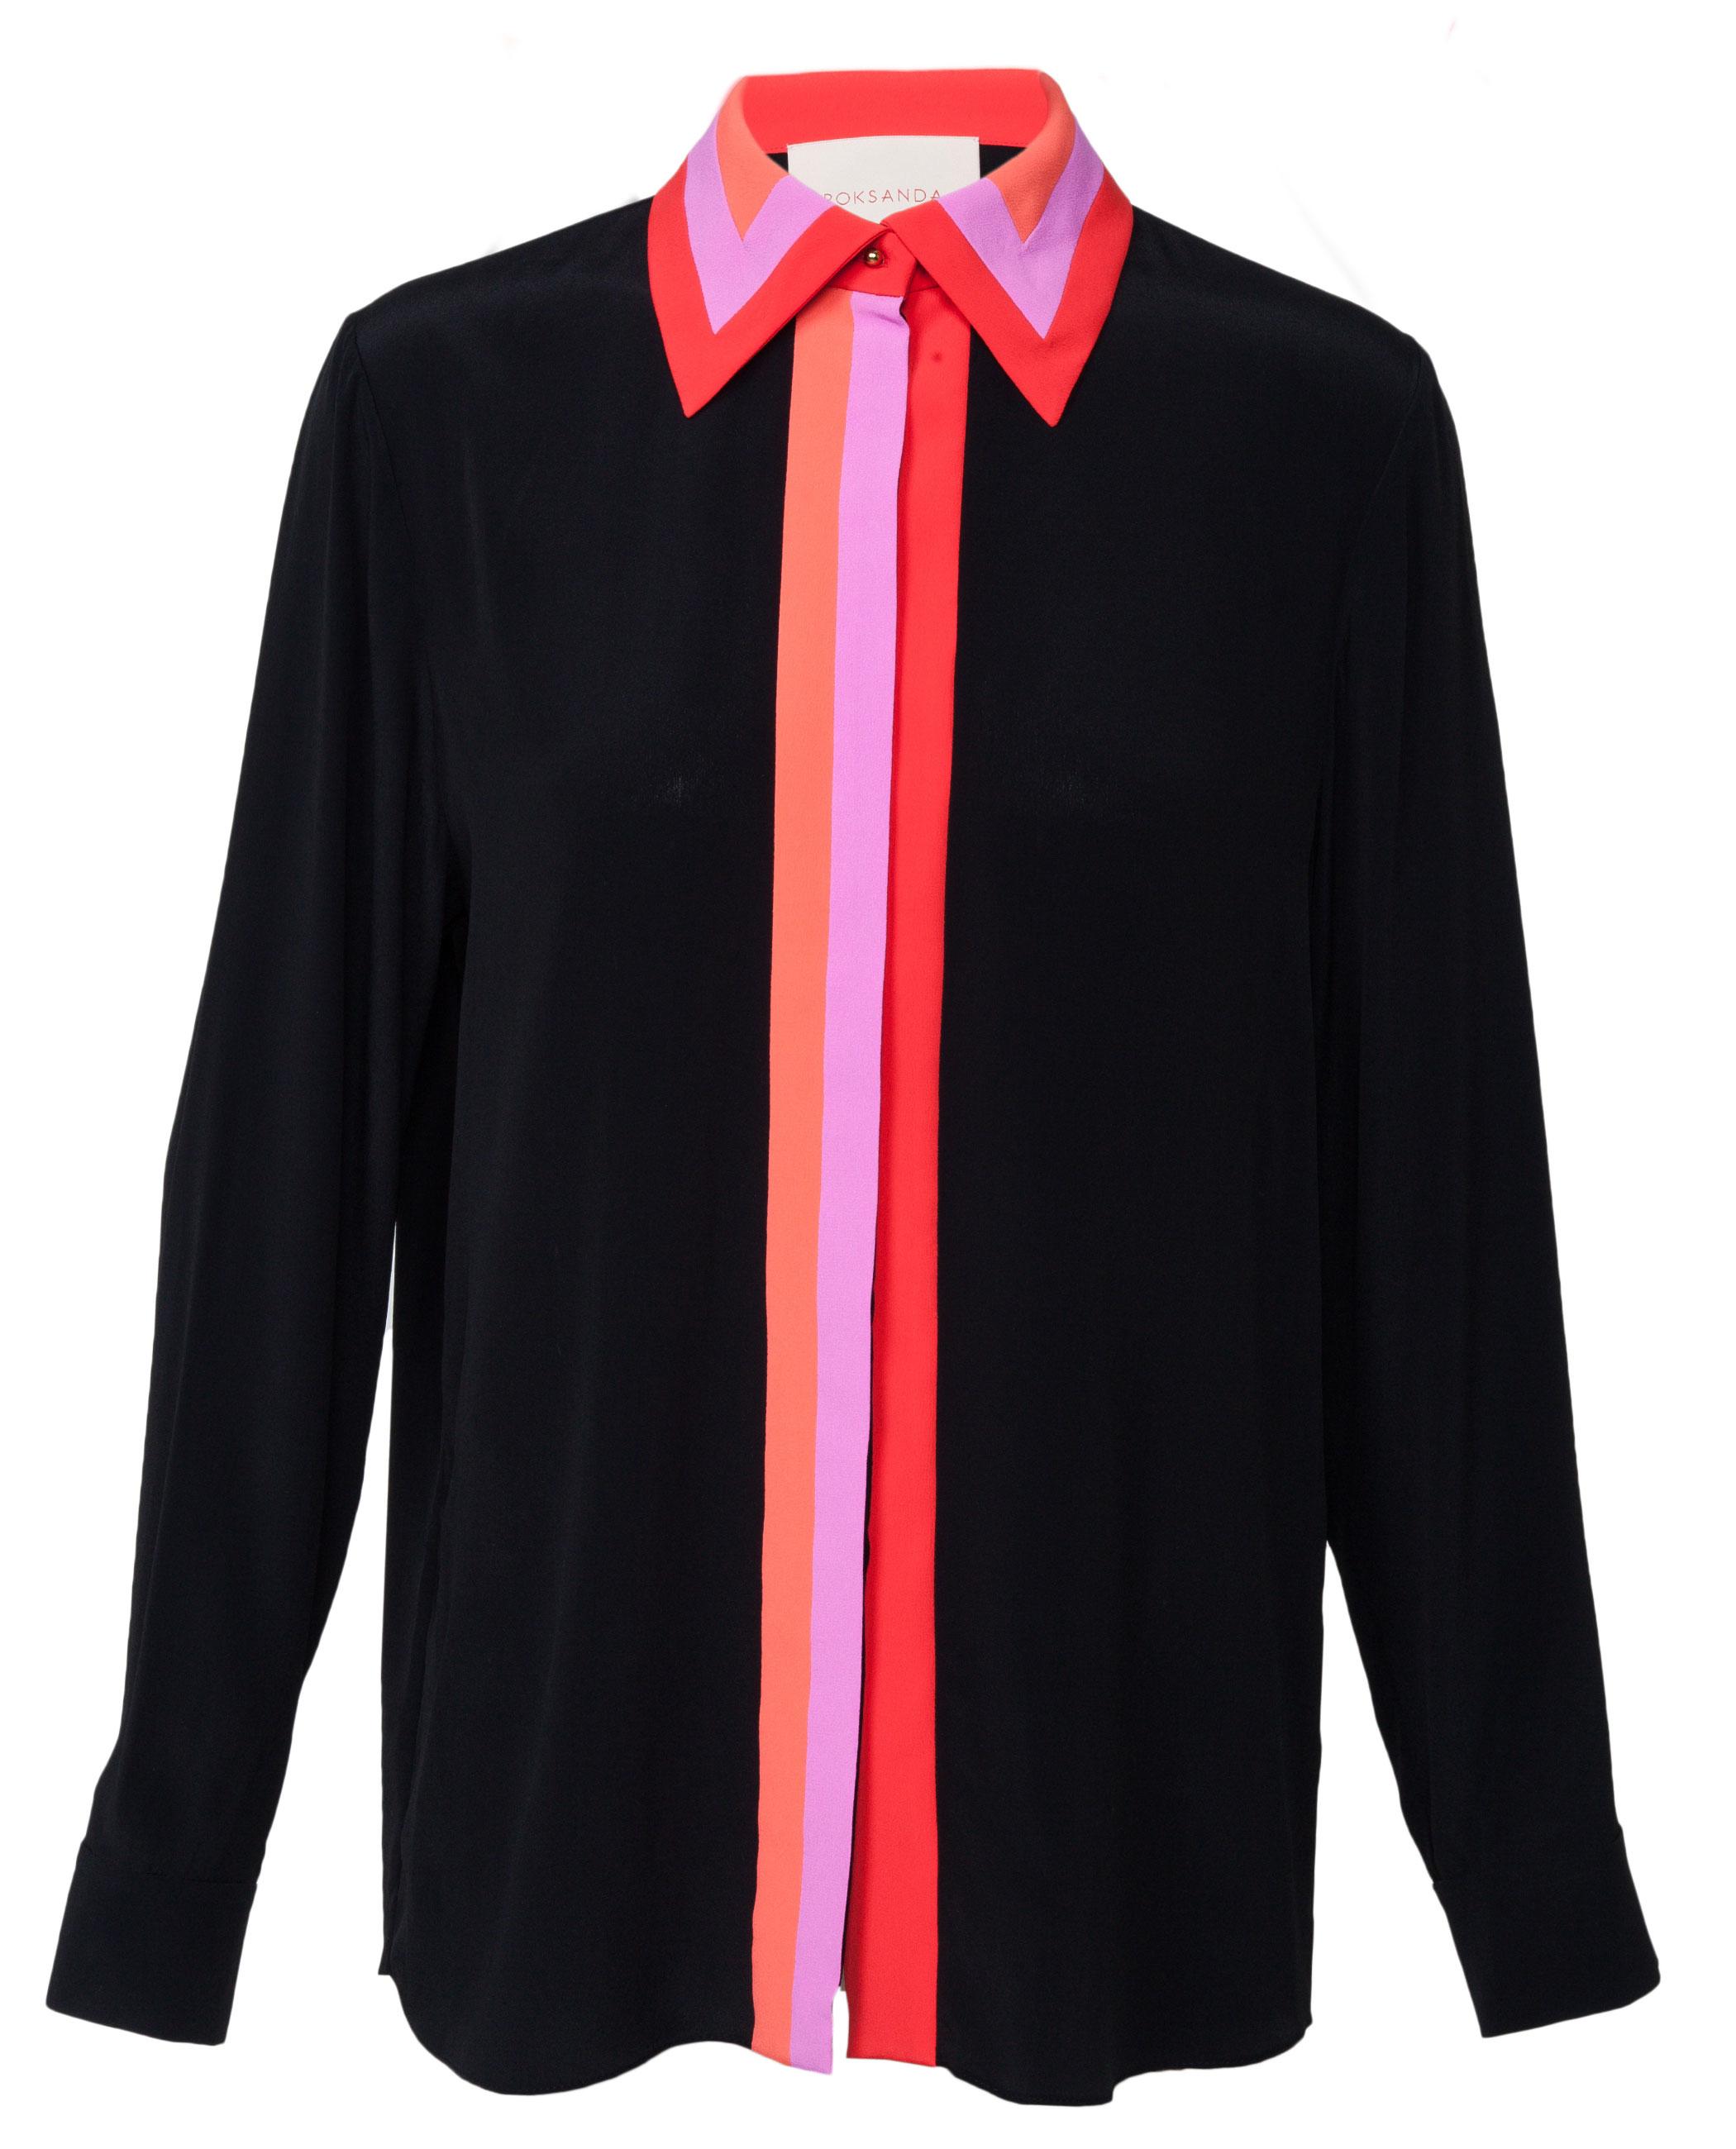 Black t shirt red collar - Gallery